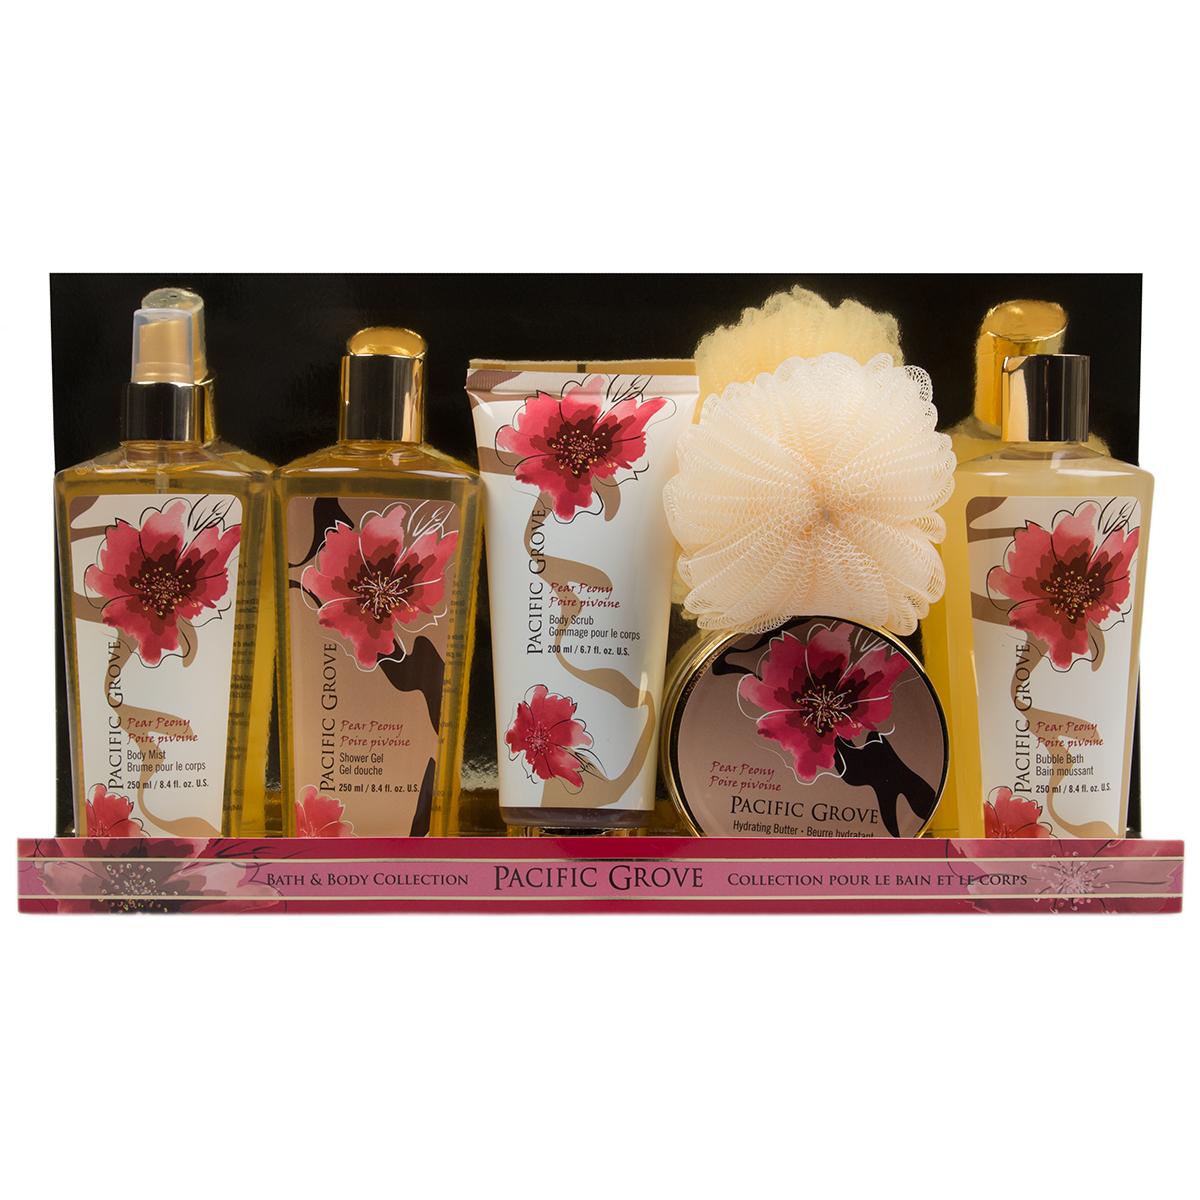 6pc Pacific Grove Bath & Body Gift Set Shower Gel Mist Bubble Scrub Lotion Pouf For Her Women